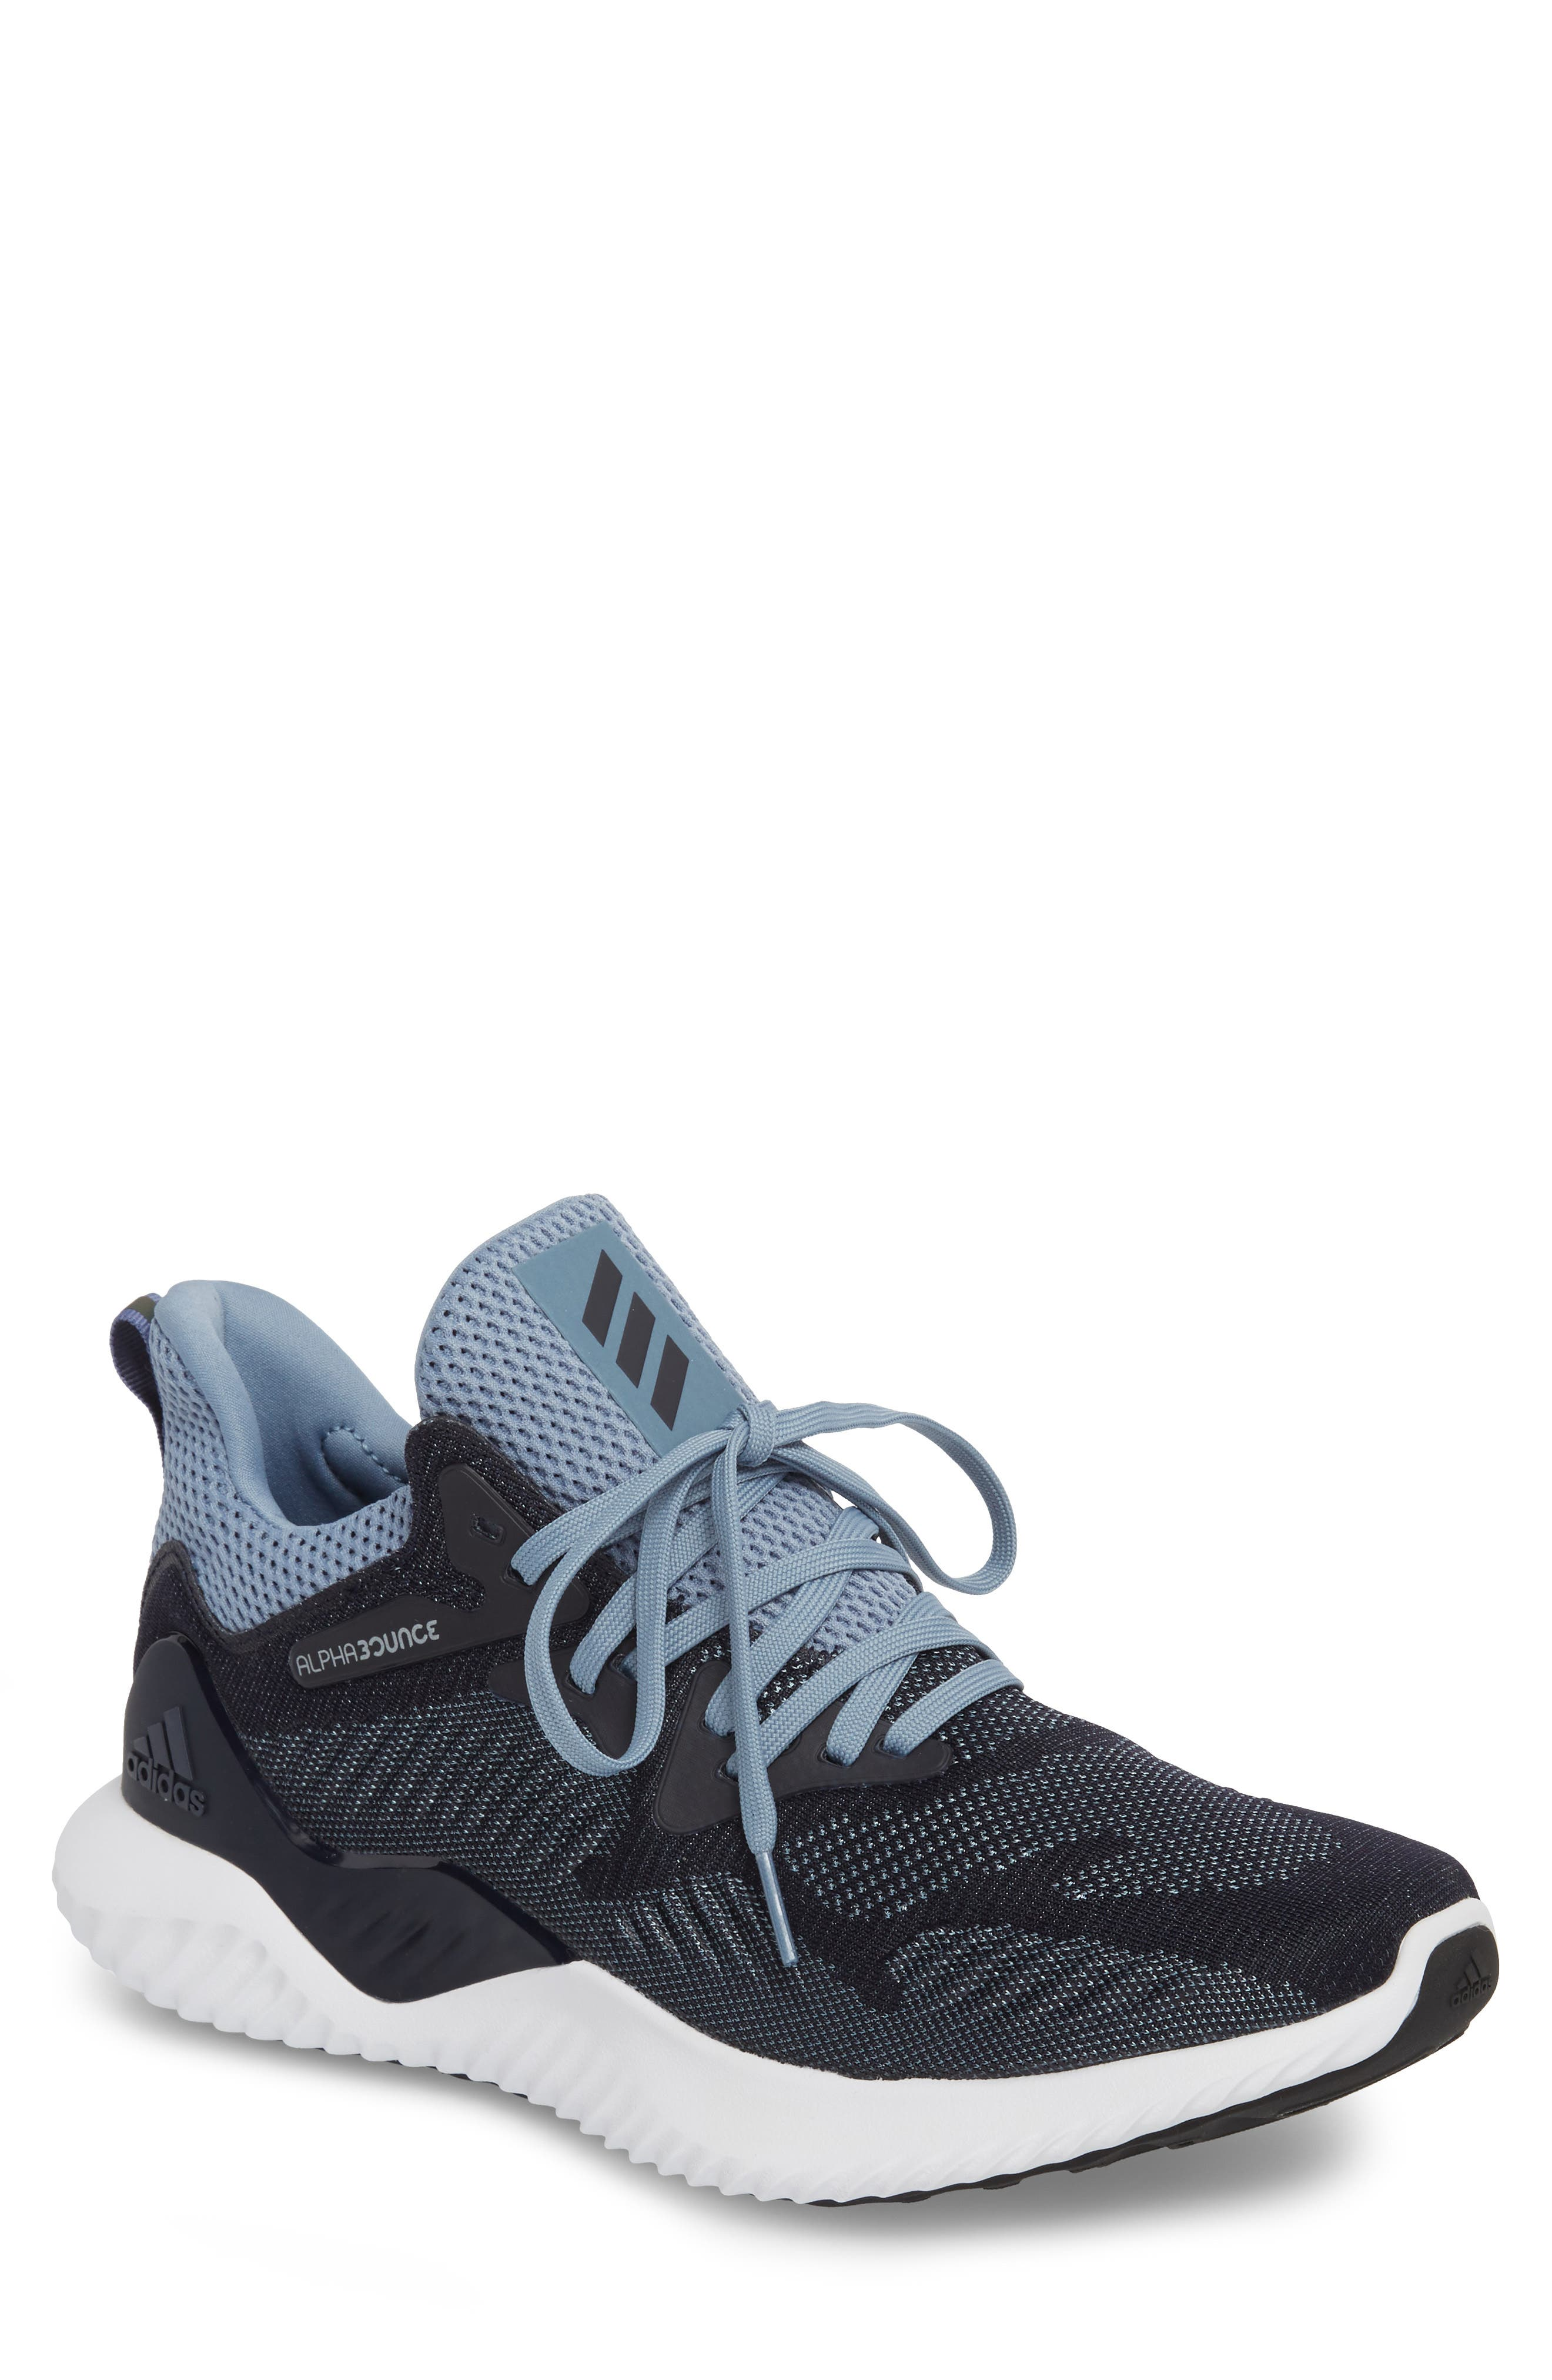 Main Image - adidas AlphaBounce Beyond Knit Running Shoe (Men)